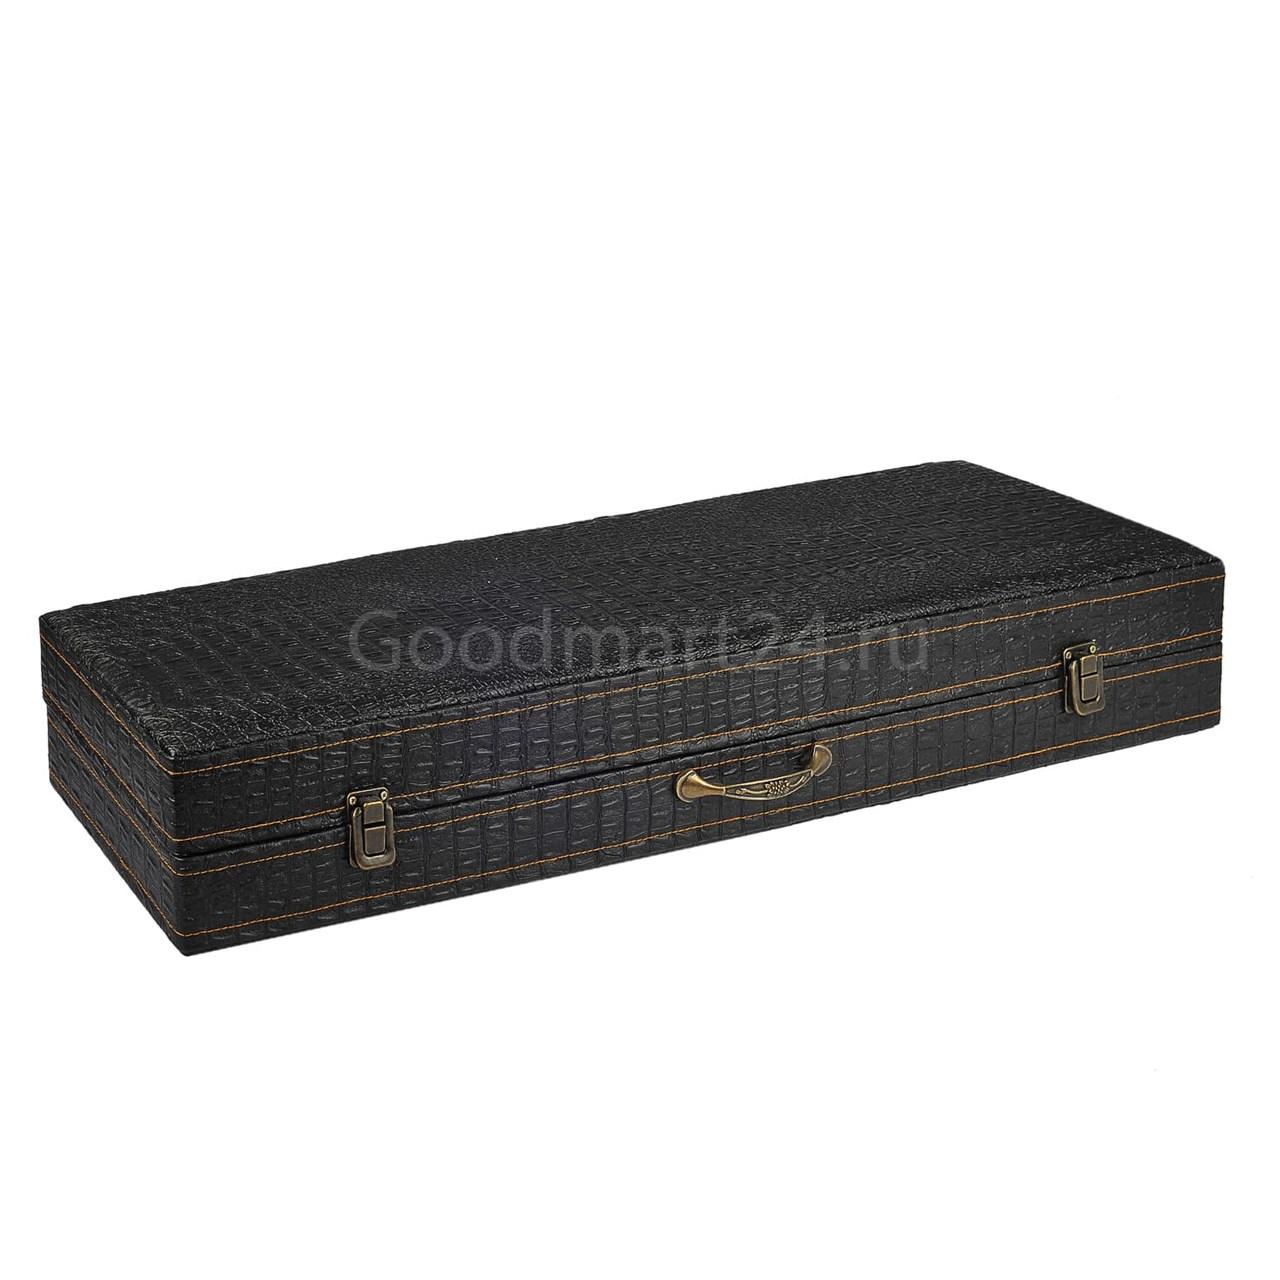 набор шампуров 6 шт в коробе кожзам